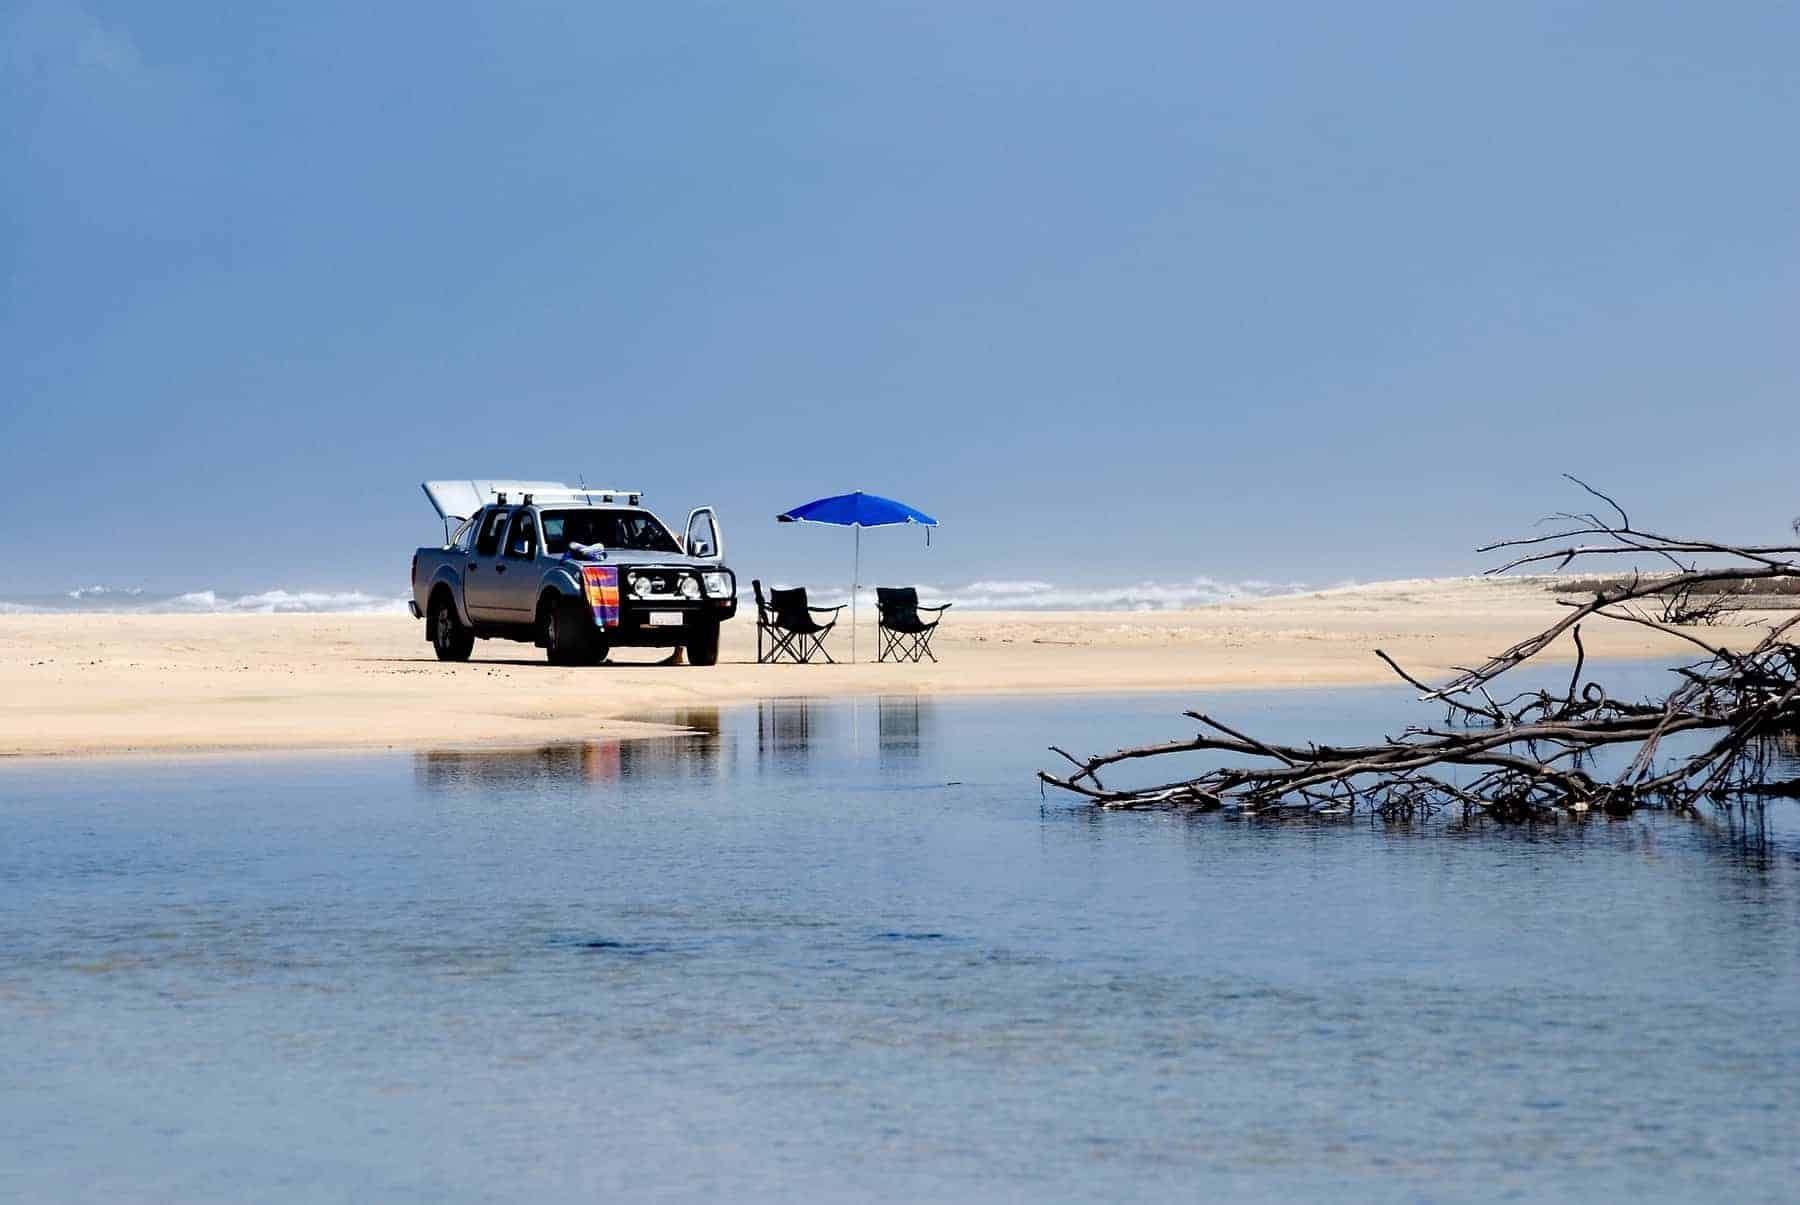 Car with beach chairs and umbrella on the Fraser Island Beach/Queensland/Australia